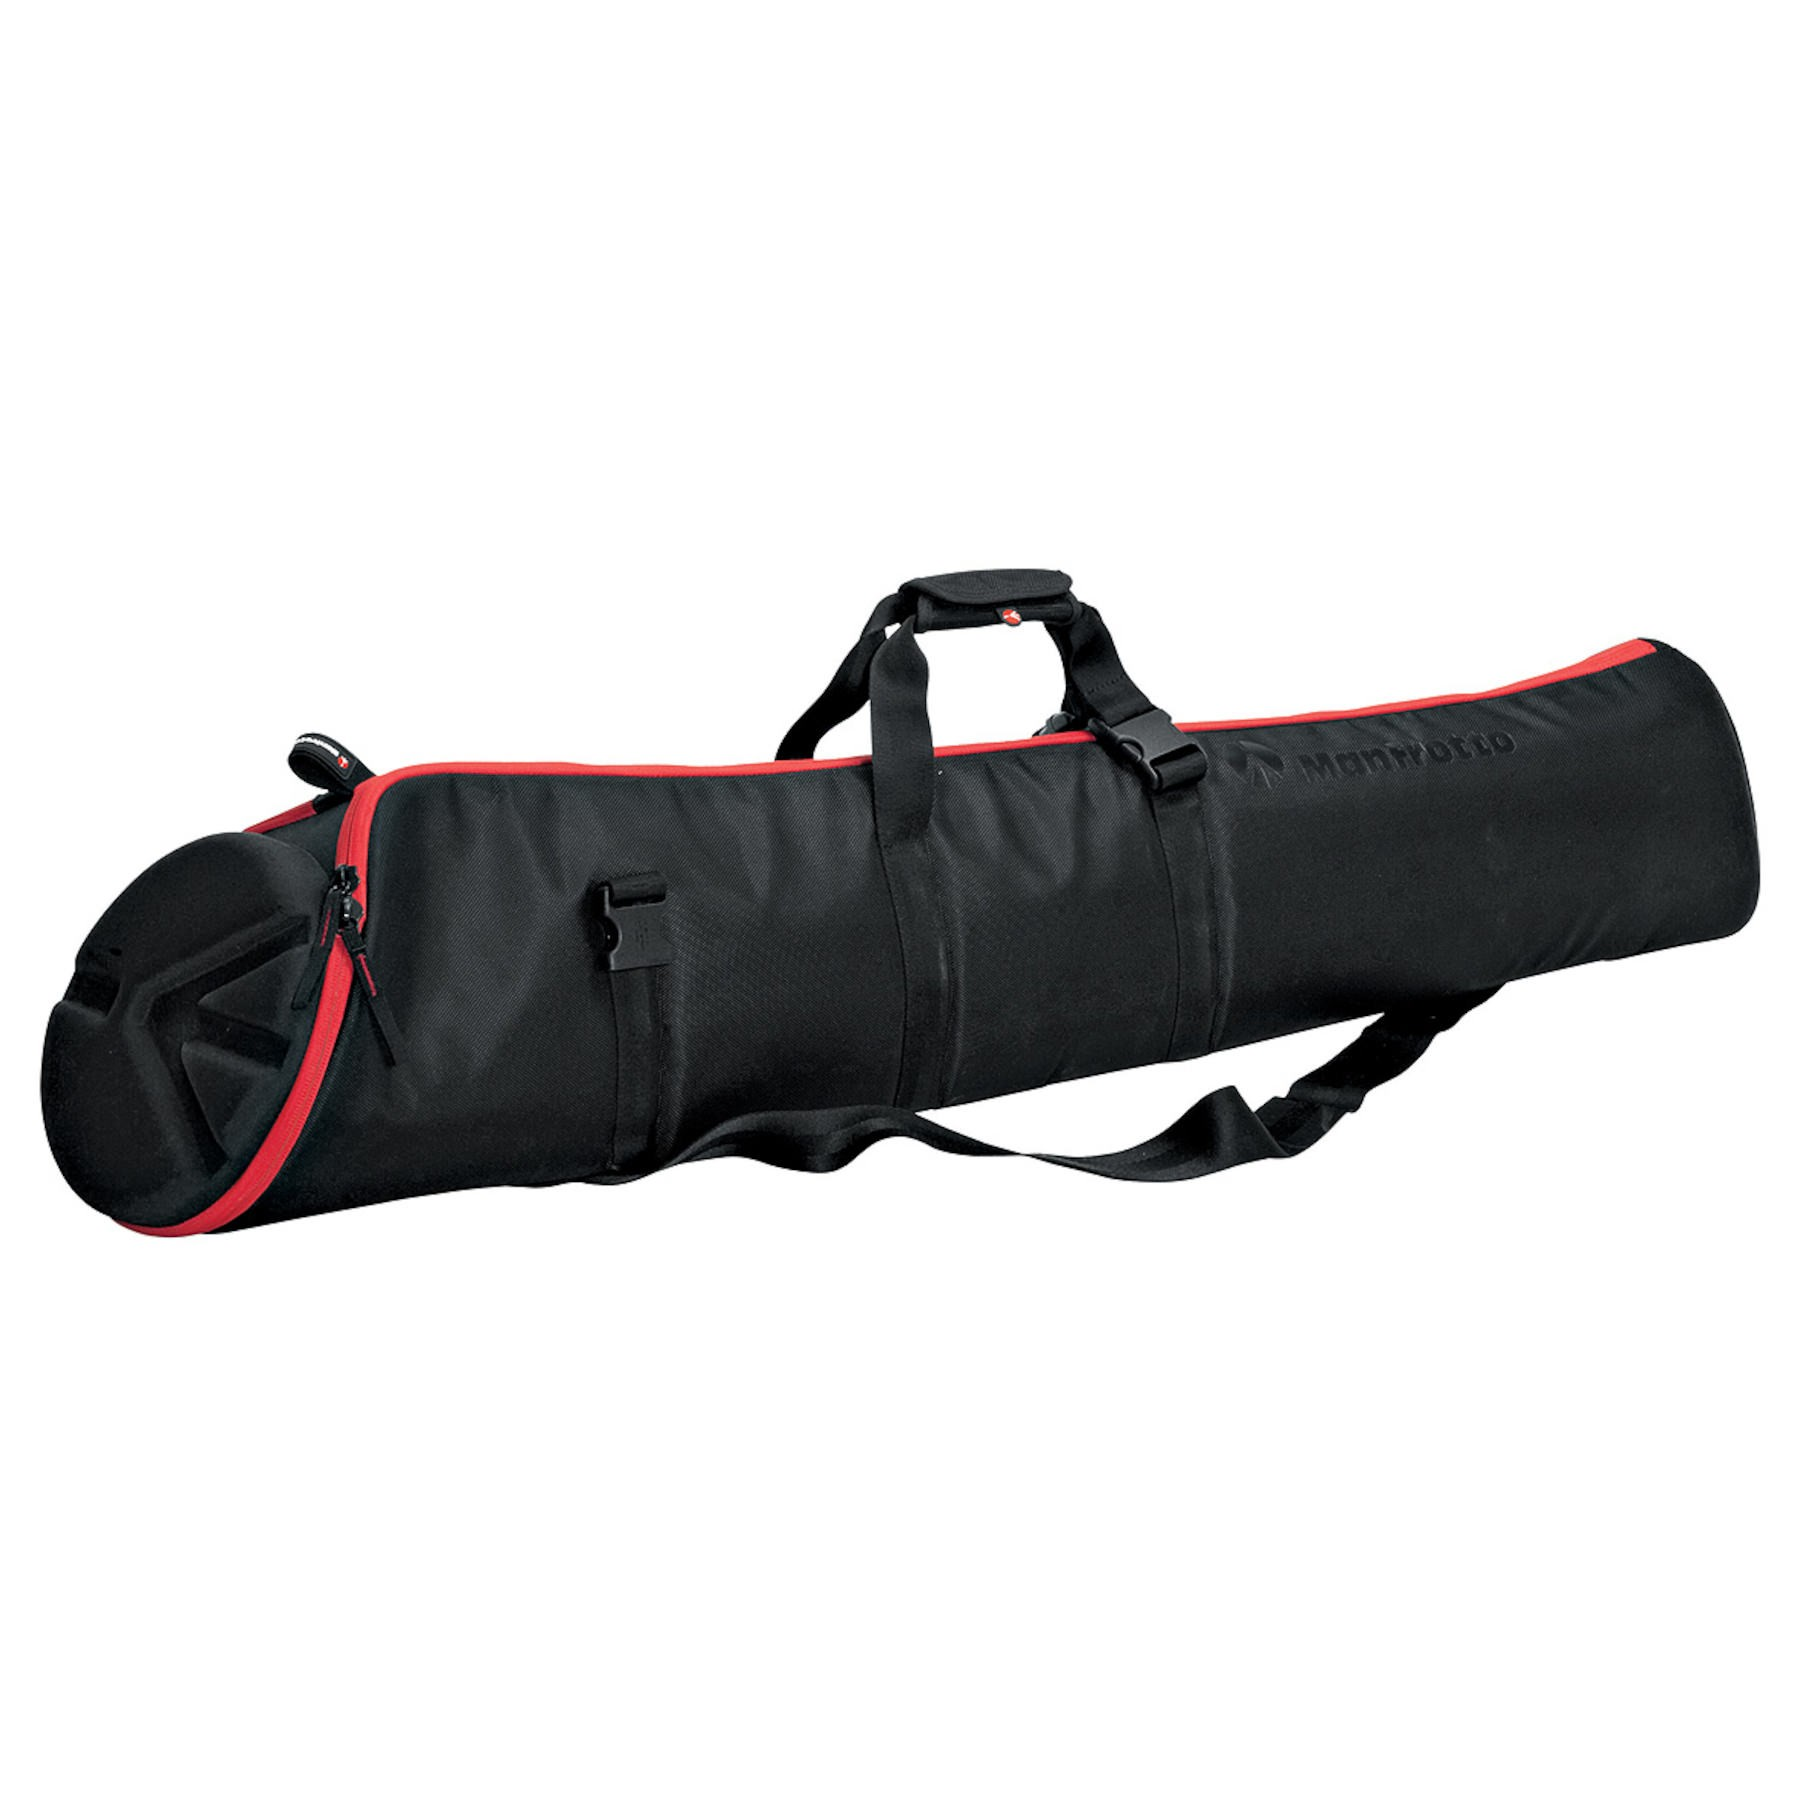 Padded Tripod Bag 120cm